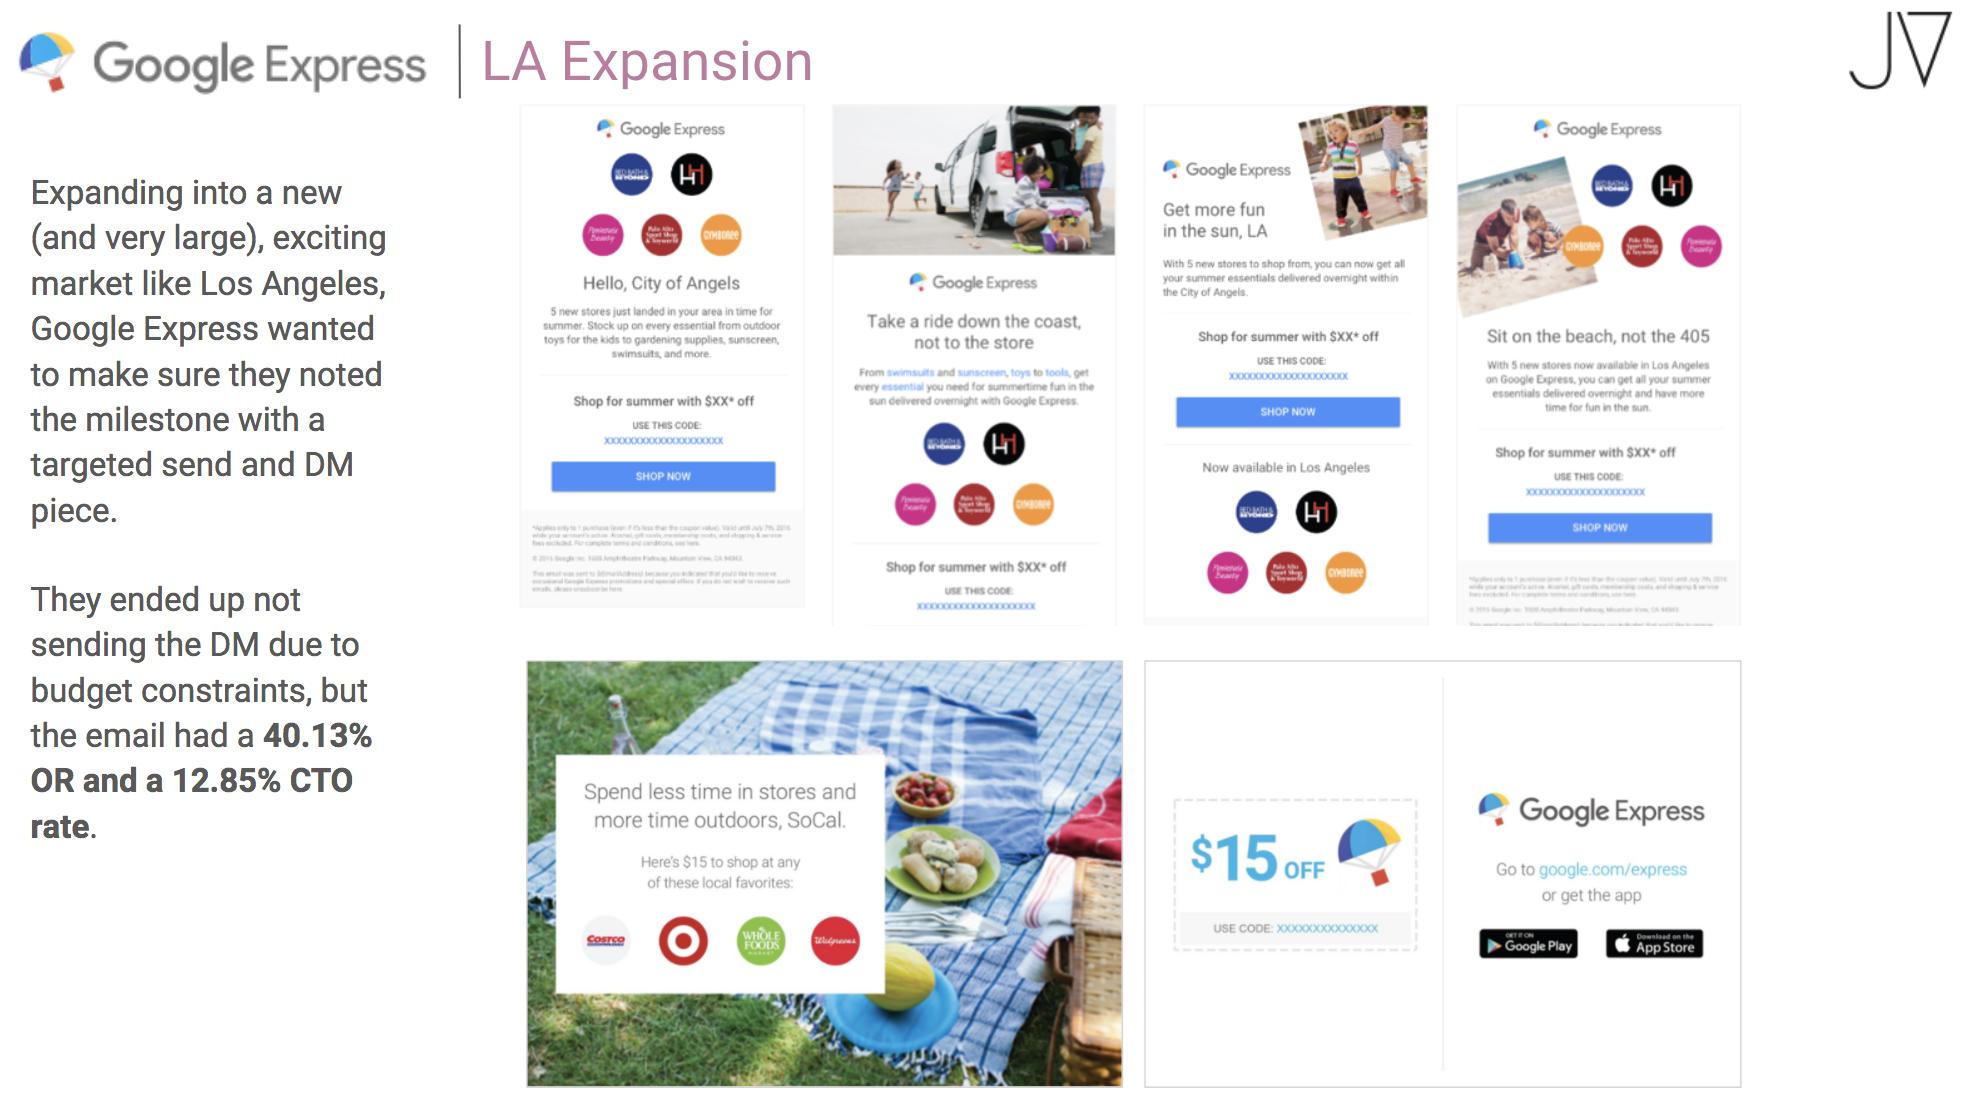 Google Express_LA Expansion_Epsilon_updated.png